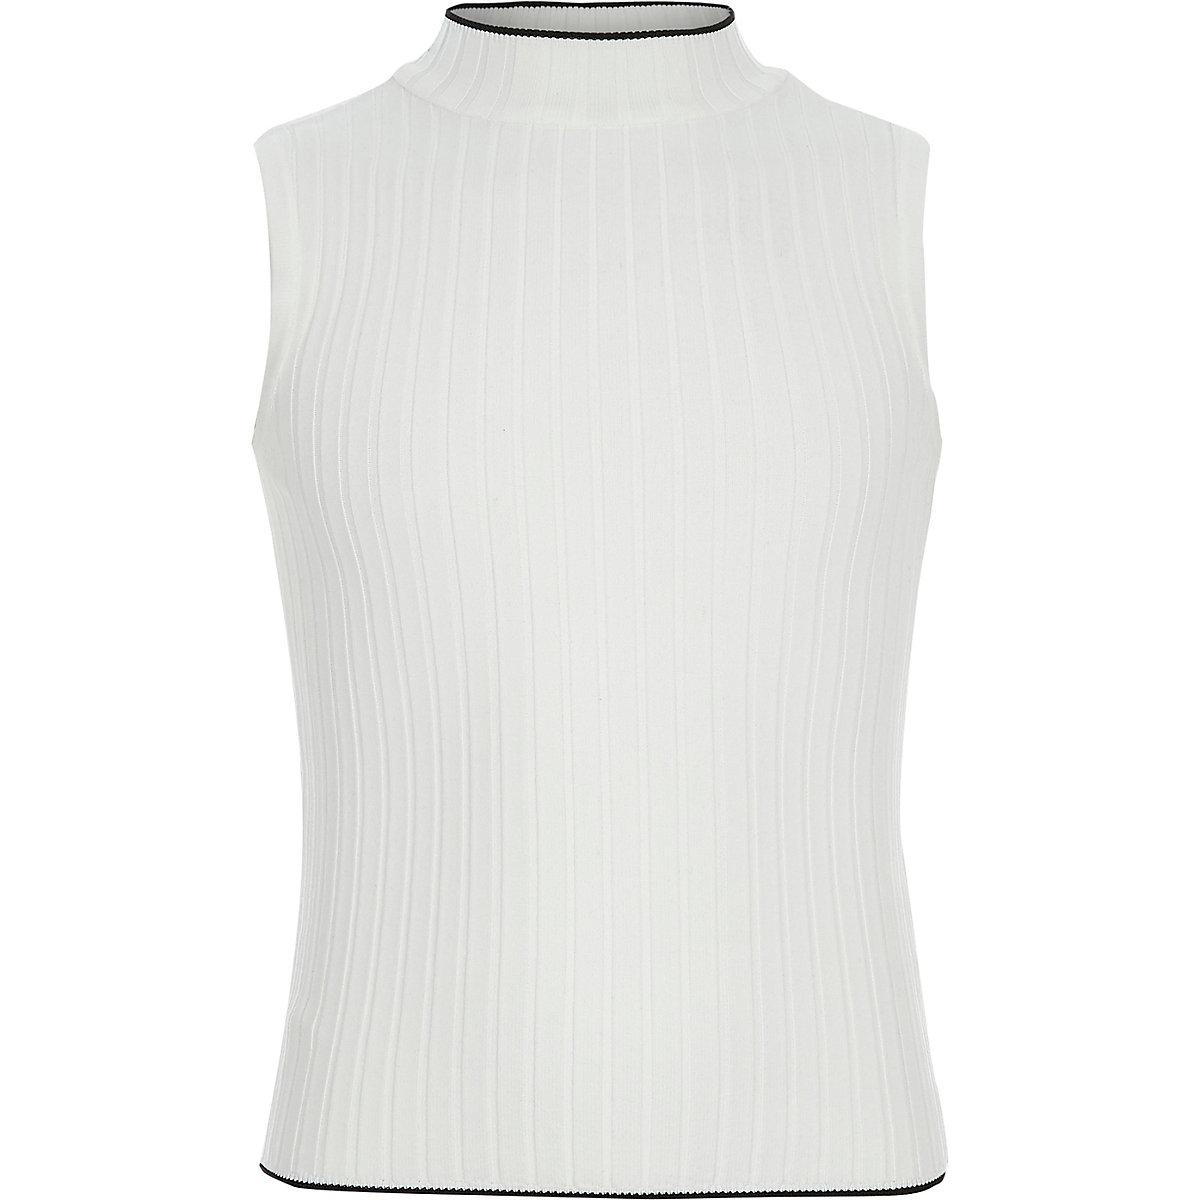 Girls cream ribbed high neck tank top